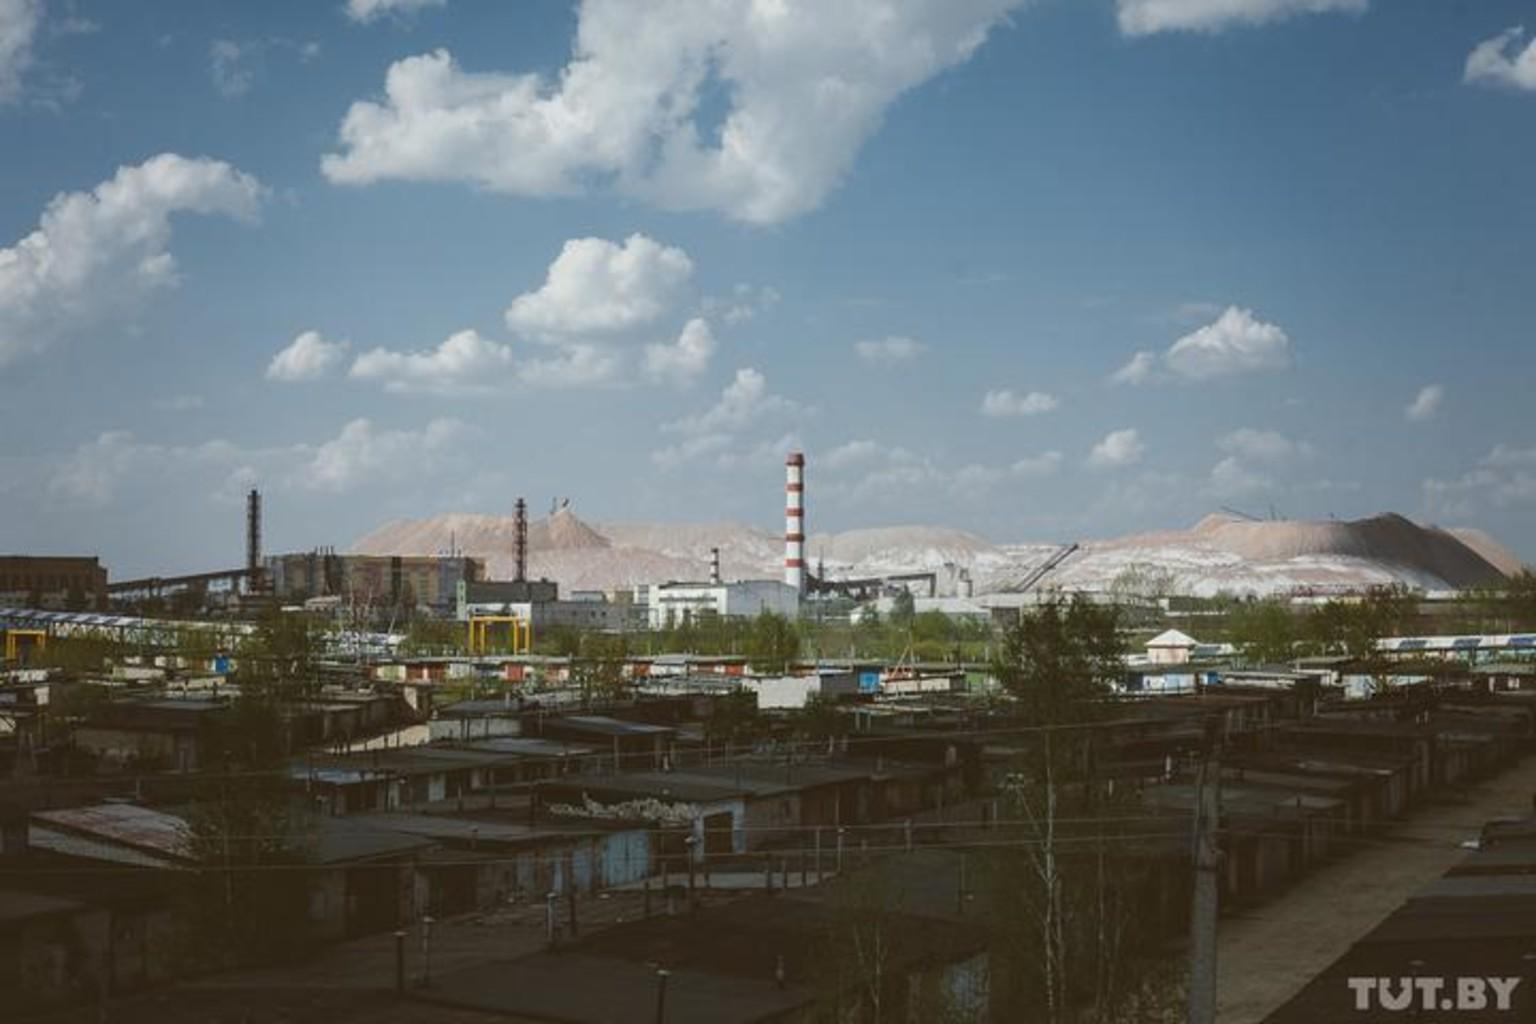 Soligorsk shakhtery vas tutby phsl 28042015 img 0731